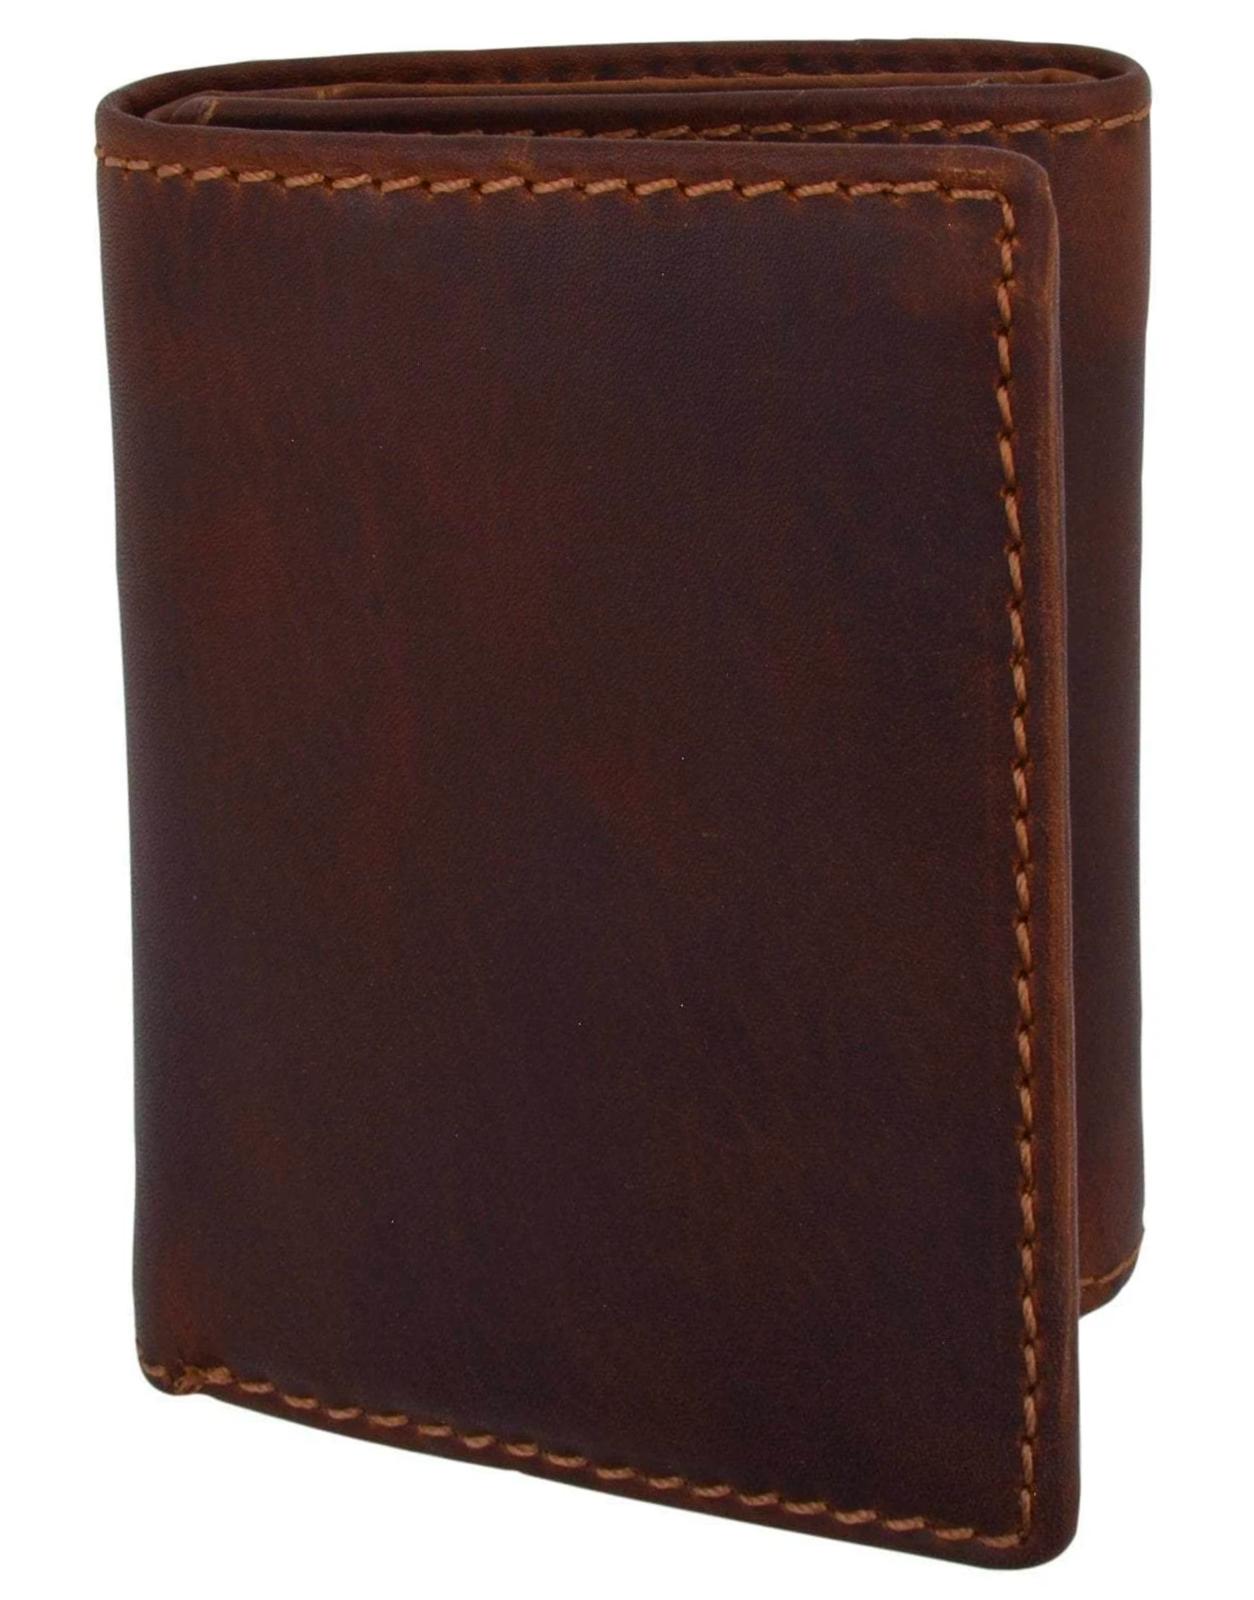 Brown RFID Blocking Vintage Hunter Leather Men's Trifold Wallet Center Flap